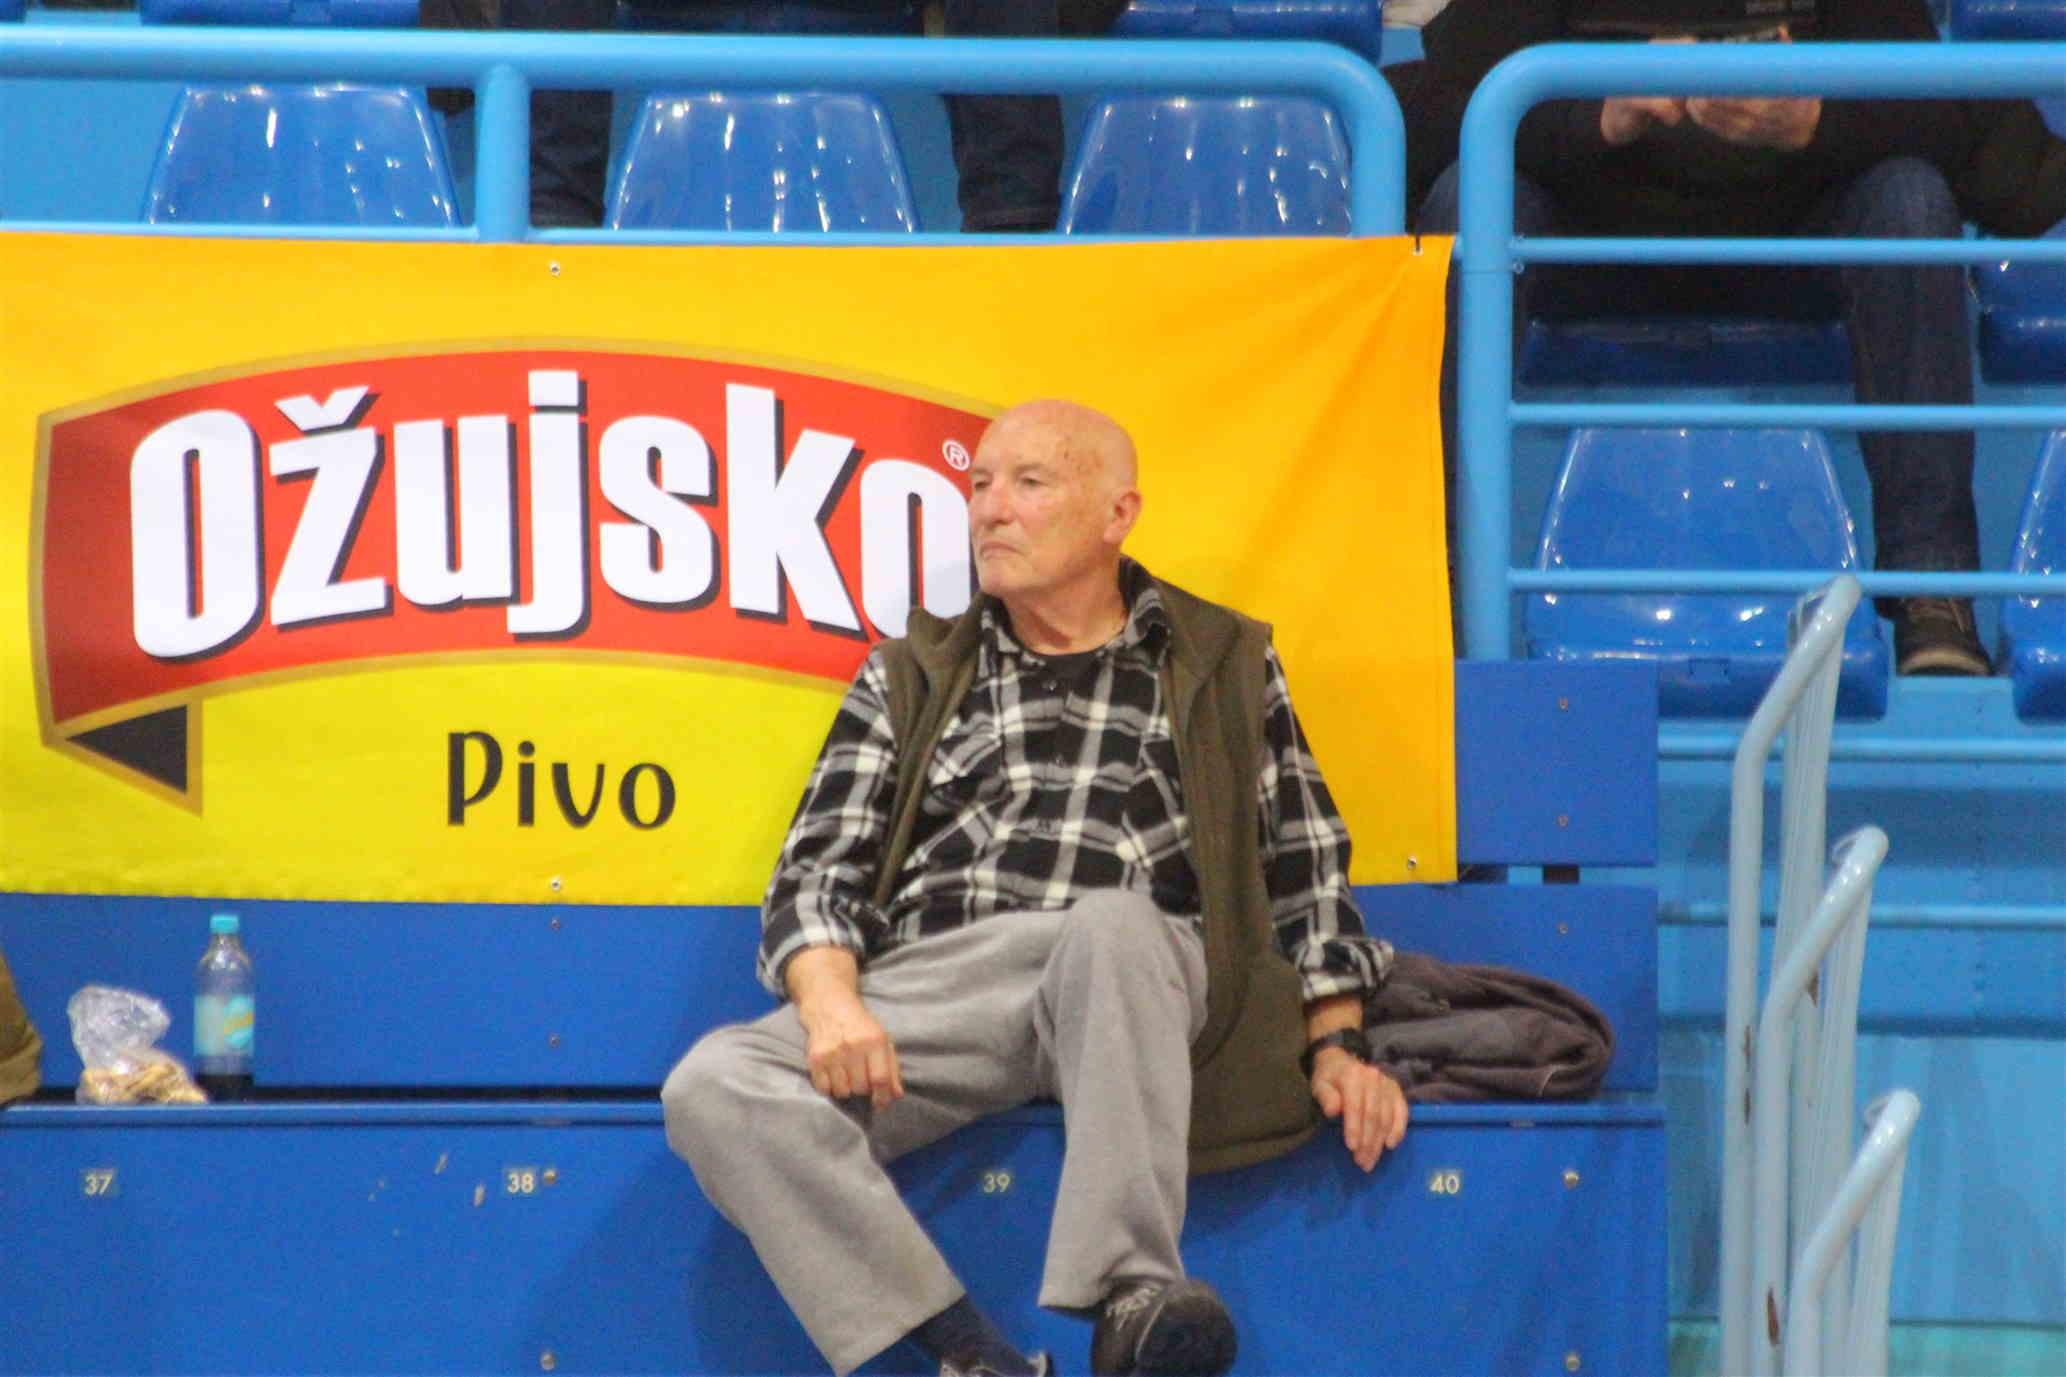 krizevci 2018 malonogometni turnir17